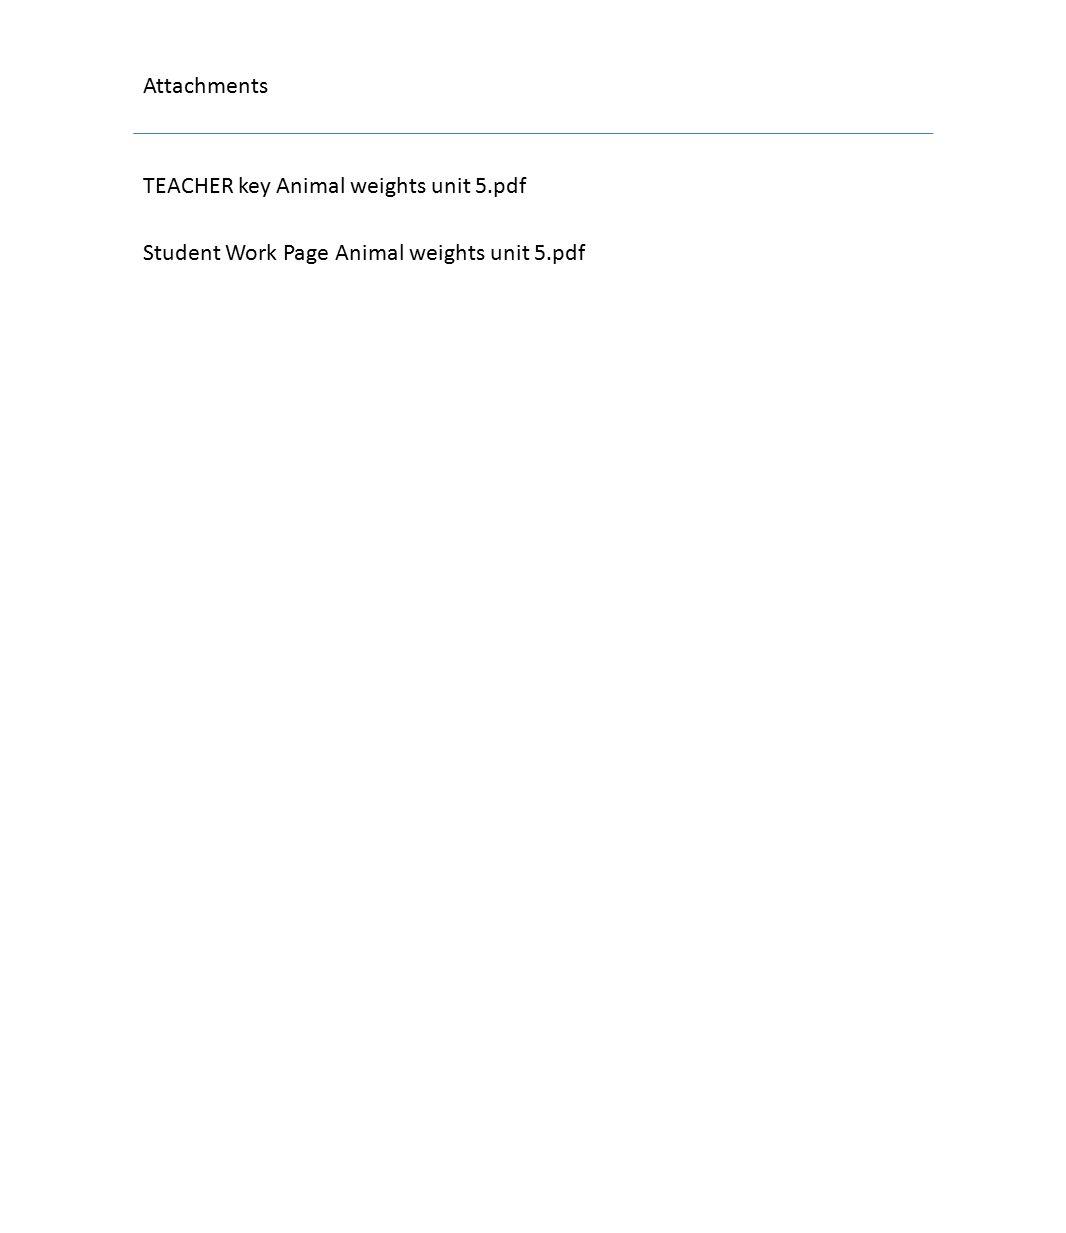 Attachments TEACHER key Animal weights unit 5.pdf Student Work Page Animal weights unit 5.pdf